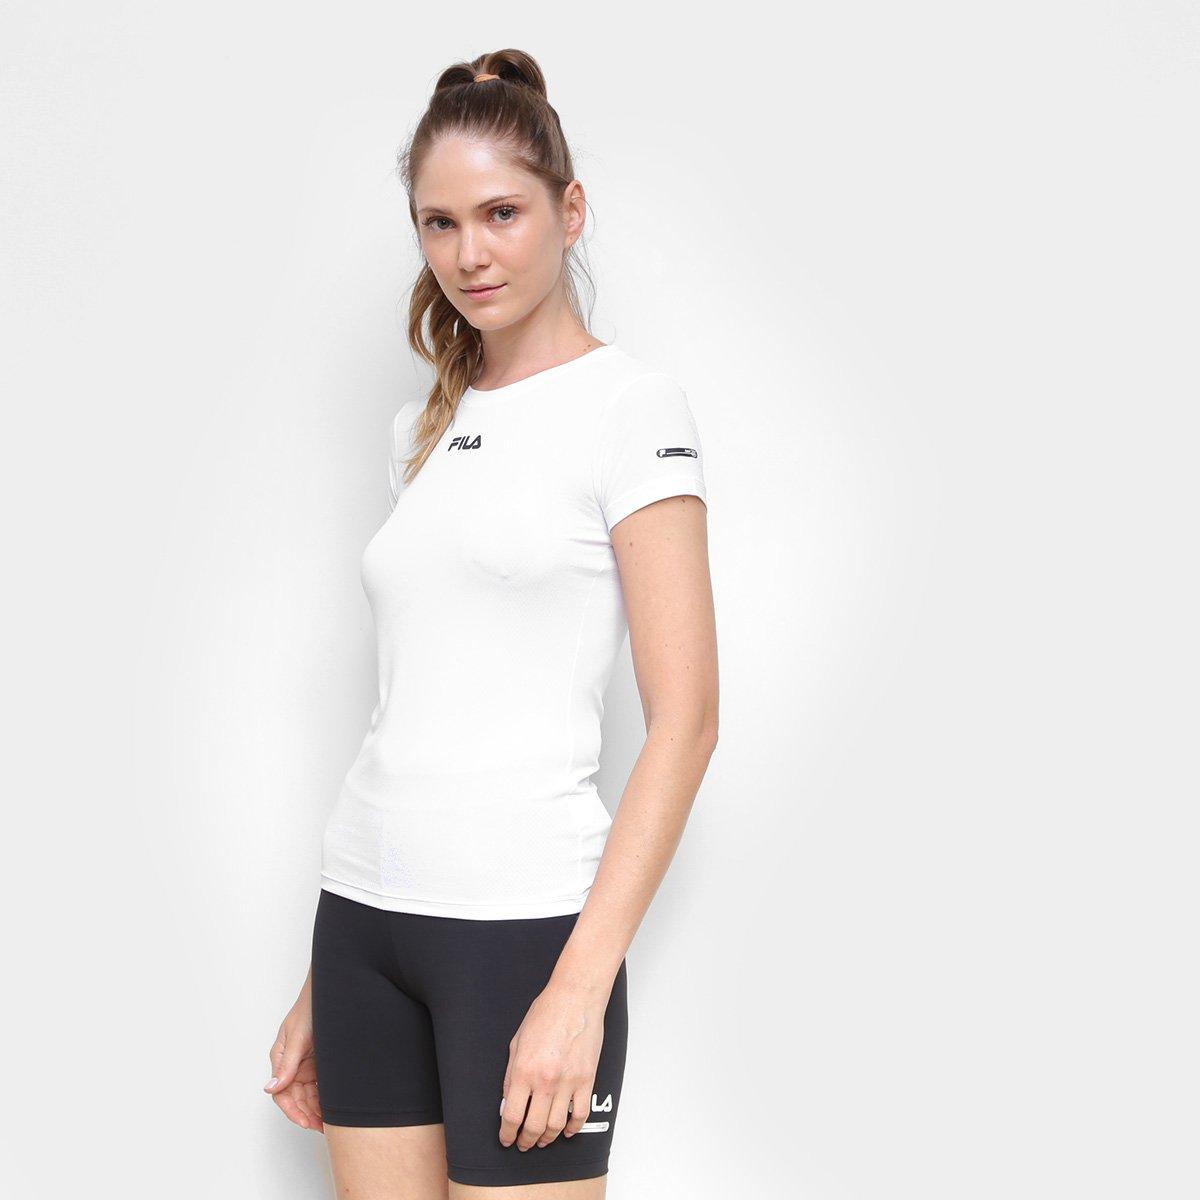 Camiseta Fila Bio Antiviral Feminina